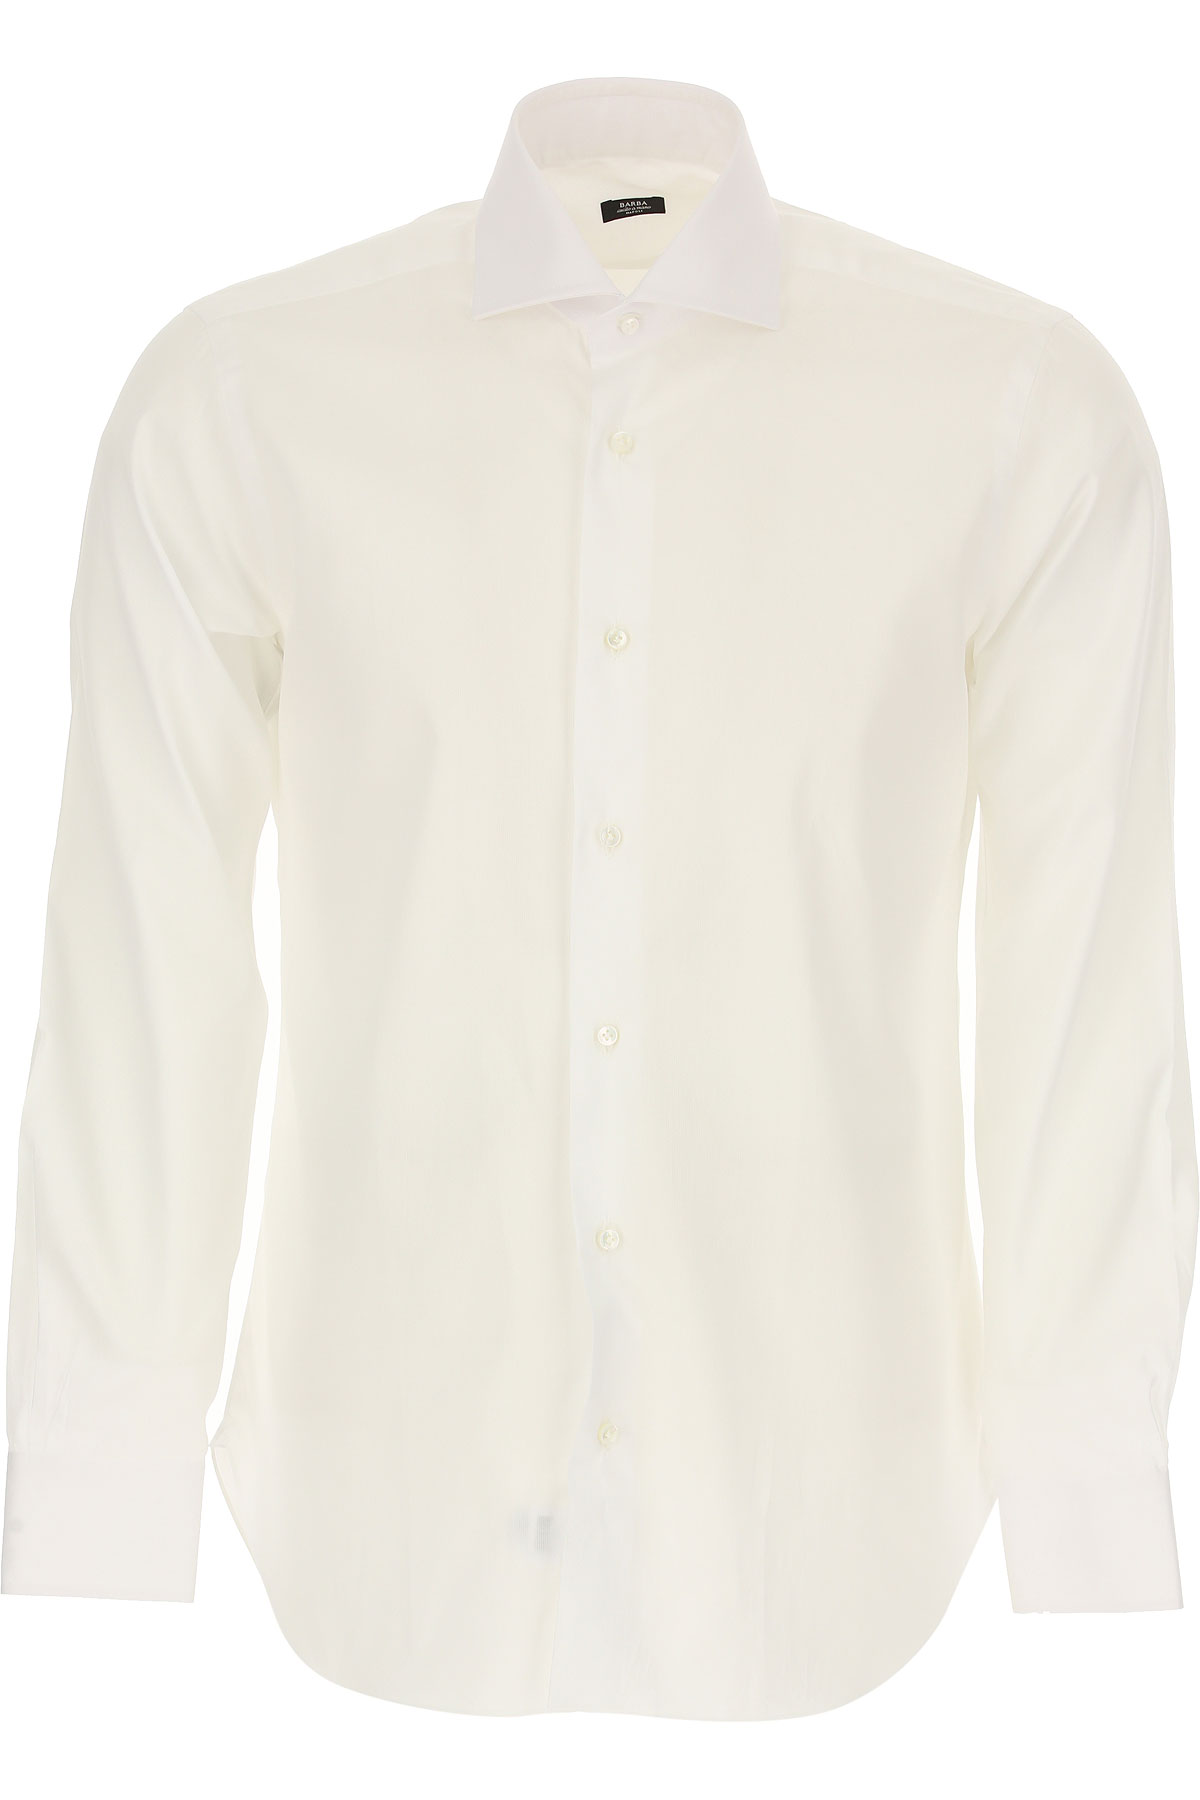 Barba Shirt for Men On Sale, White, Cotton, 2019, 15 15.75 16.5 17